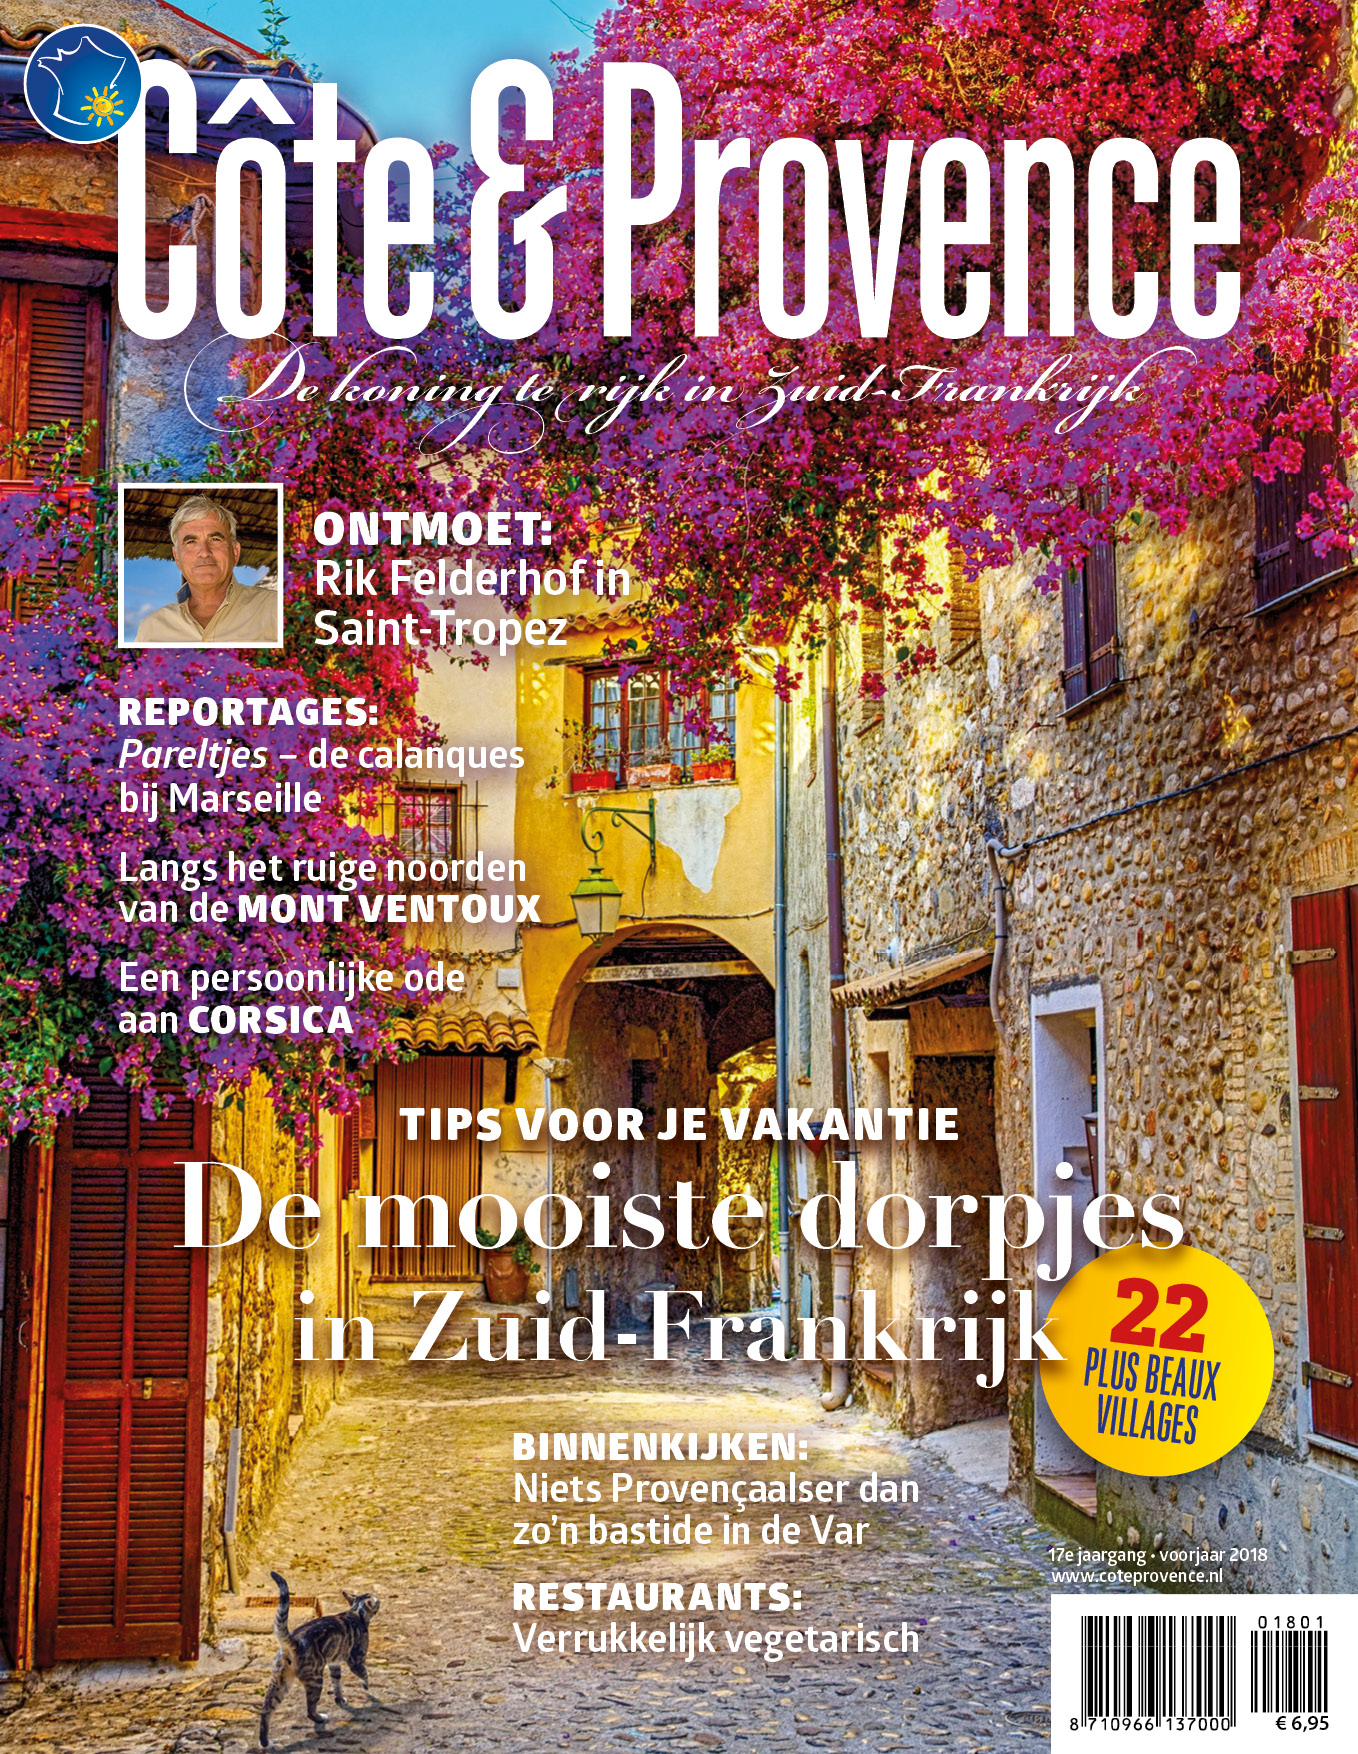 cote-en-provence